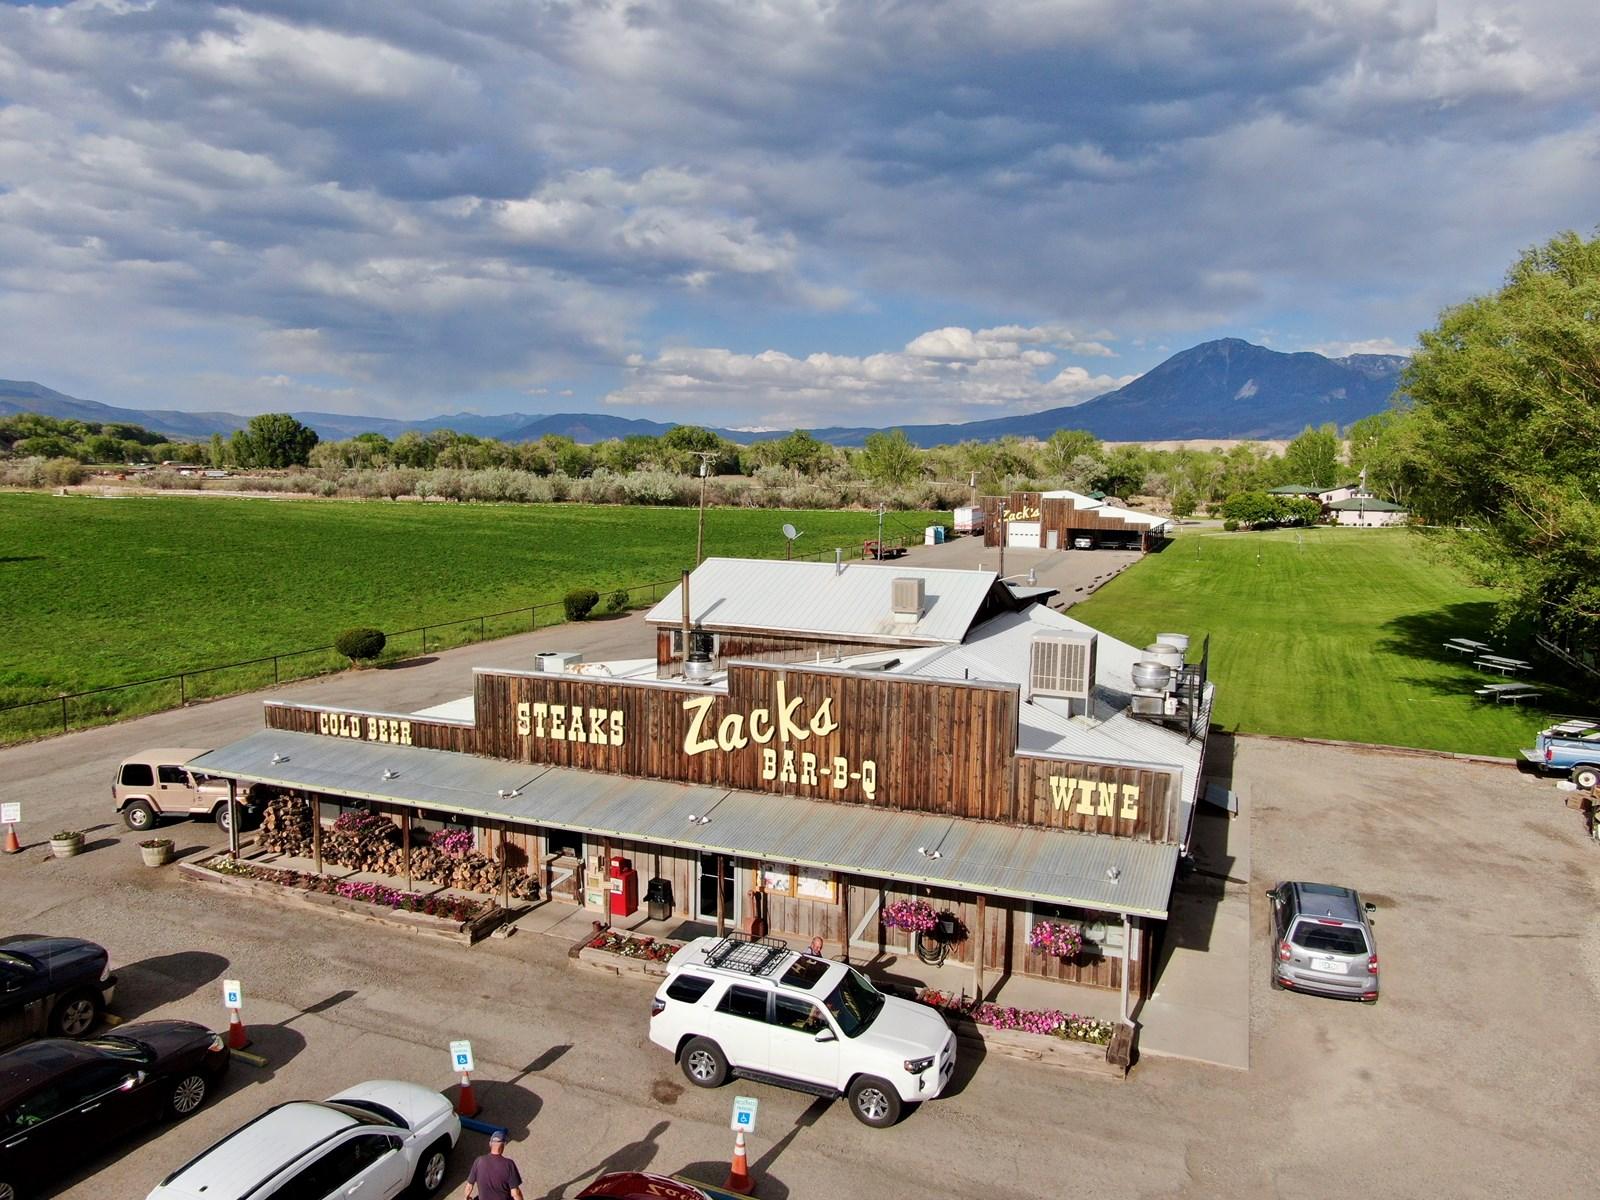 Zack's Bar-B-Q Restaurant For Sale, Hotchkiss Colorado